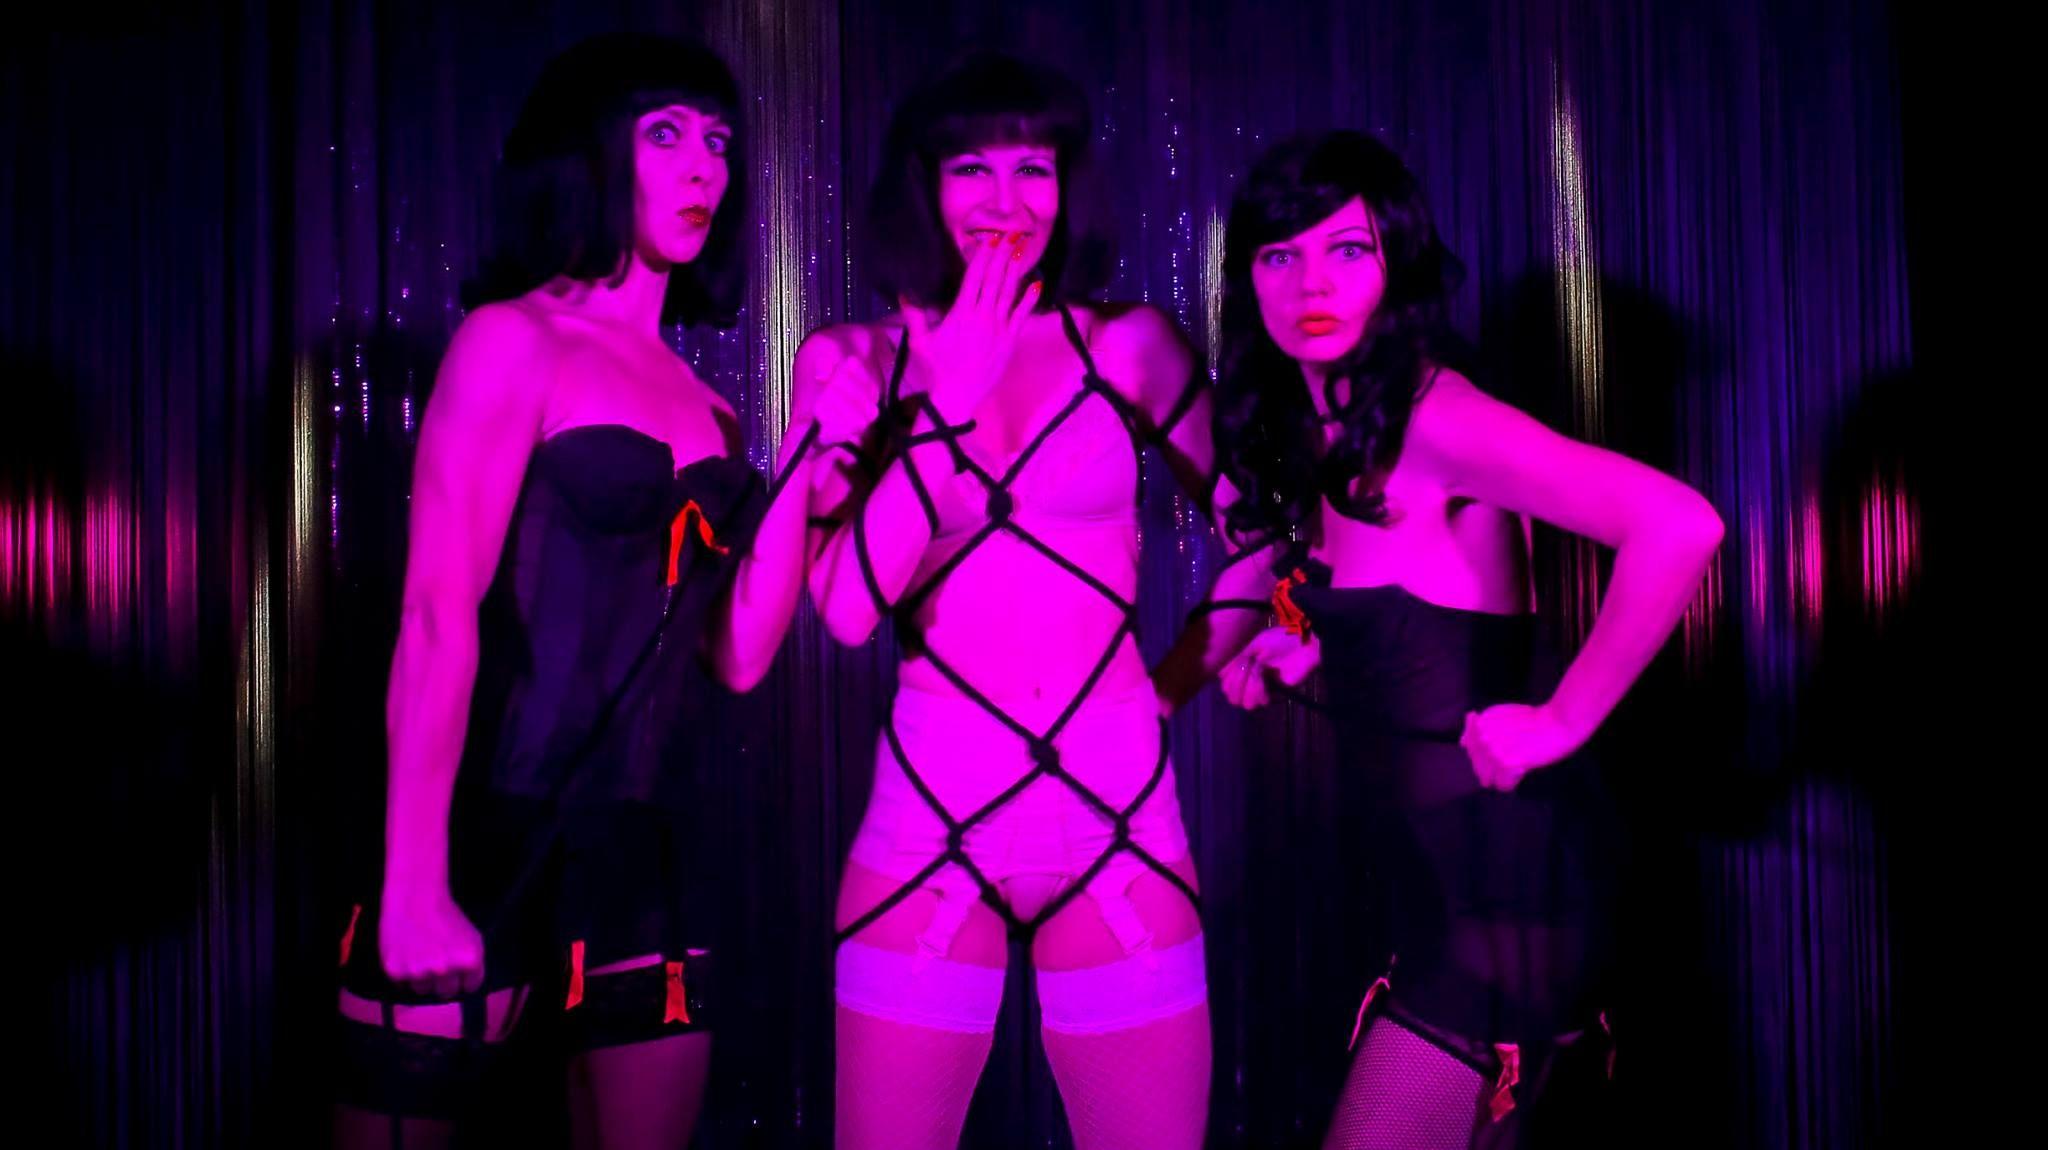 Kleine nachtrevue burlesque club Berlin Germany | Wide